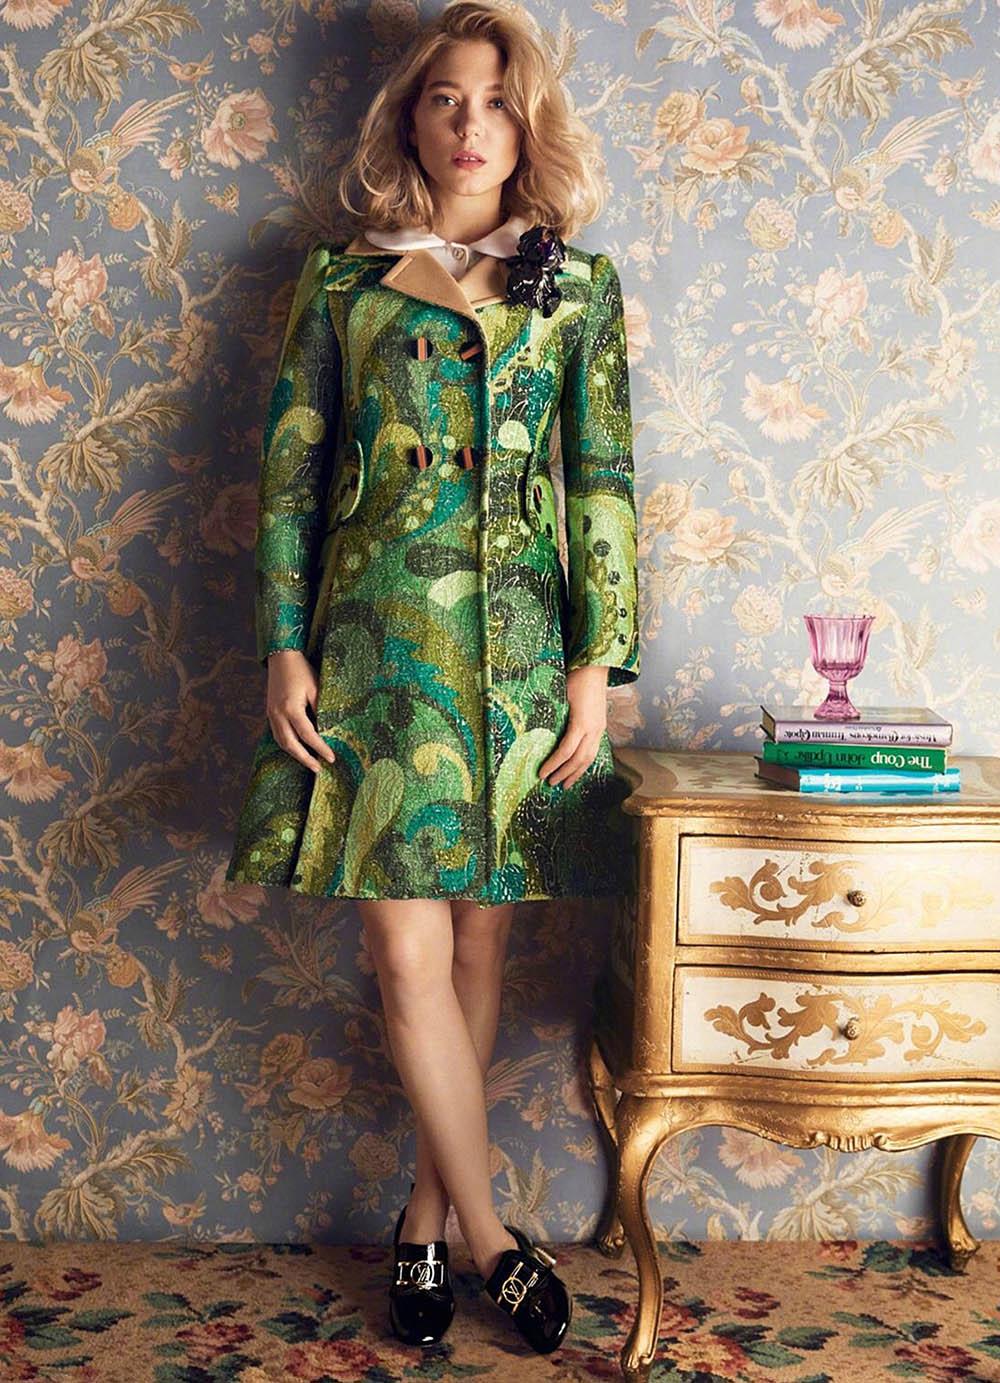 Léa Seydoux covers Harper's Bazaar UK May 2020 by Alexi Lubomirski